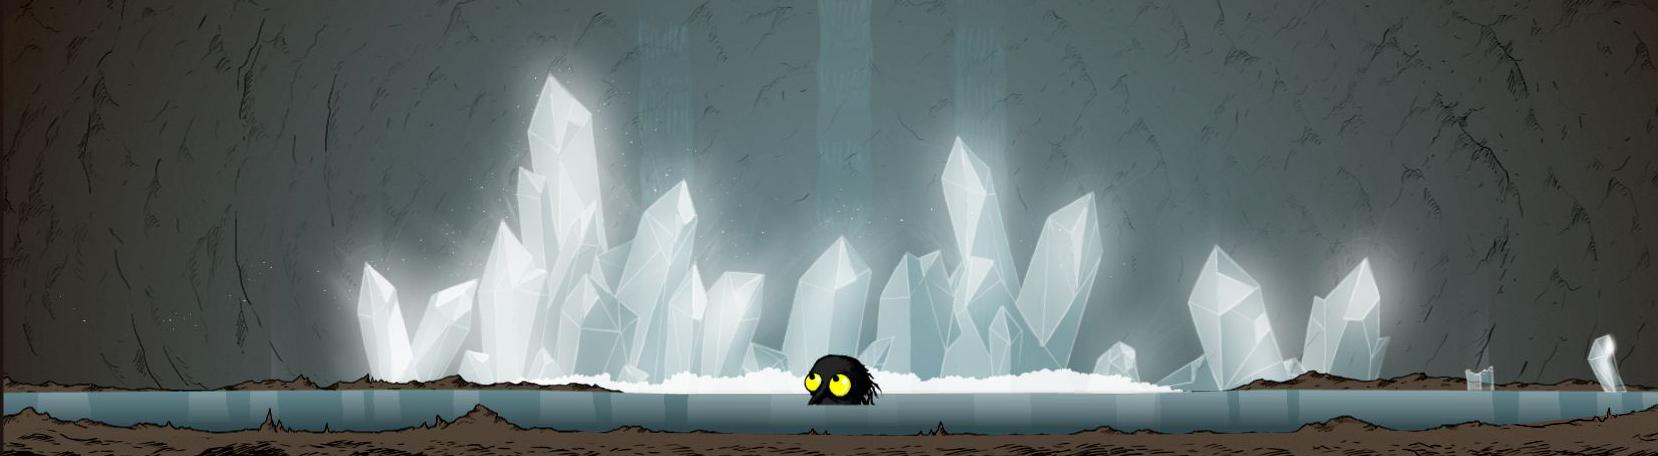 "Ein Screenshot aus dem Game ""The Longing"""